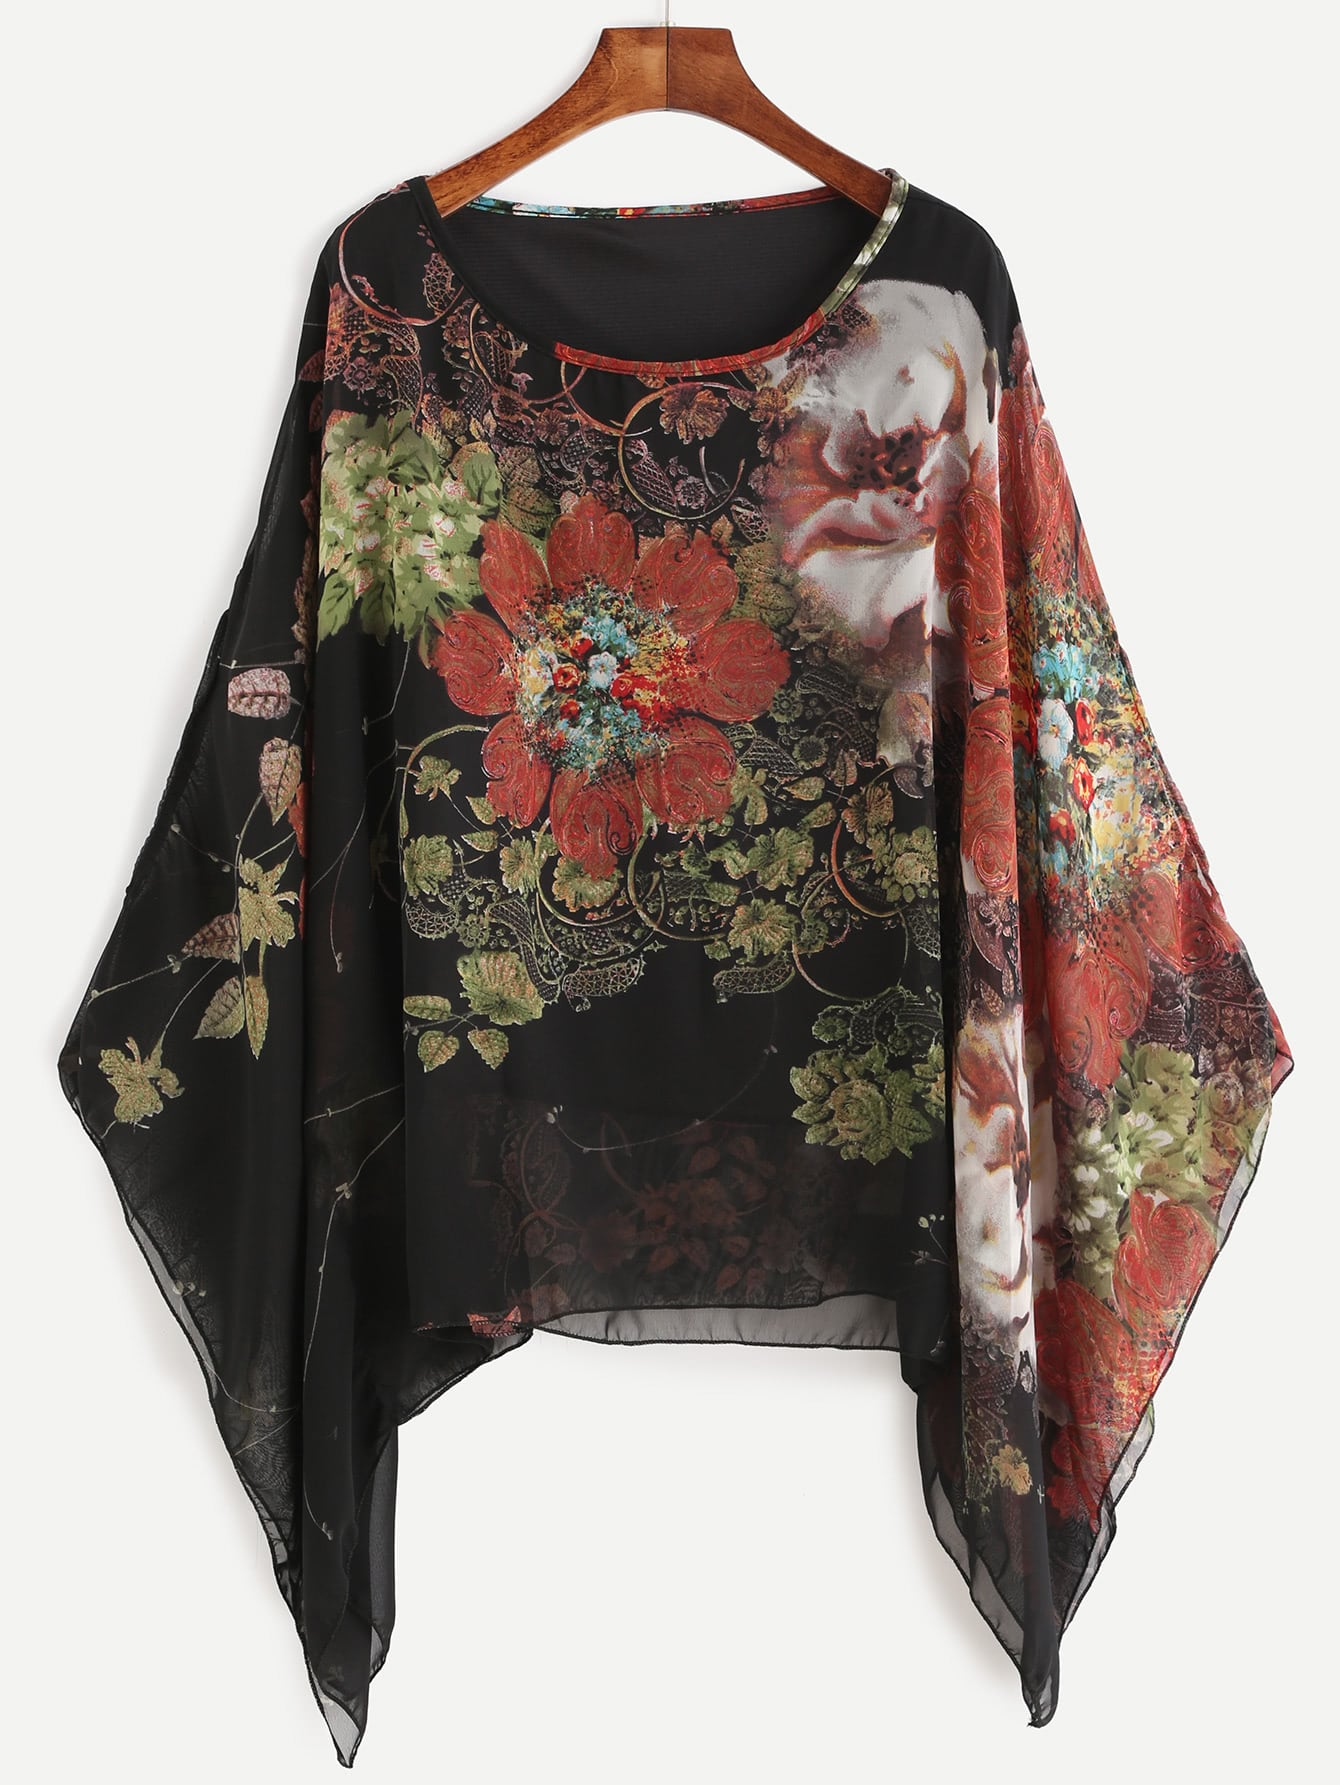 Kimono Sleeve Florals Chiffon Blouse